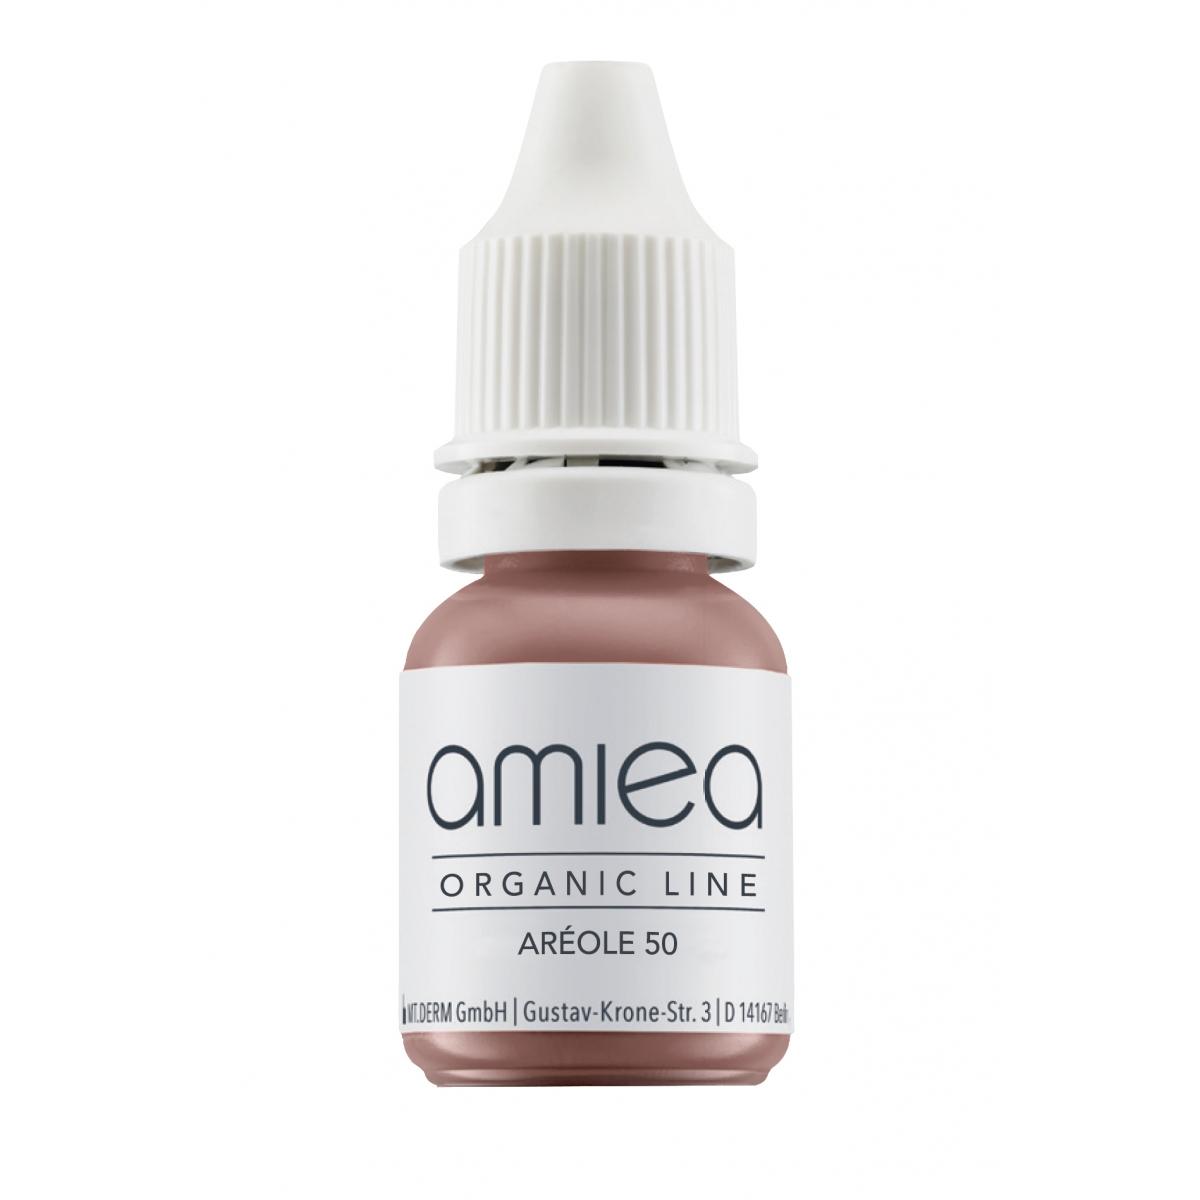 Organicline (10 ml) - PIGMENTS AMIEA ORGANICLINE AREOLES 50, Flacon 10 ml